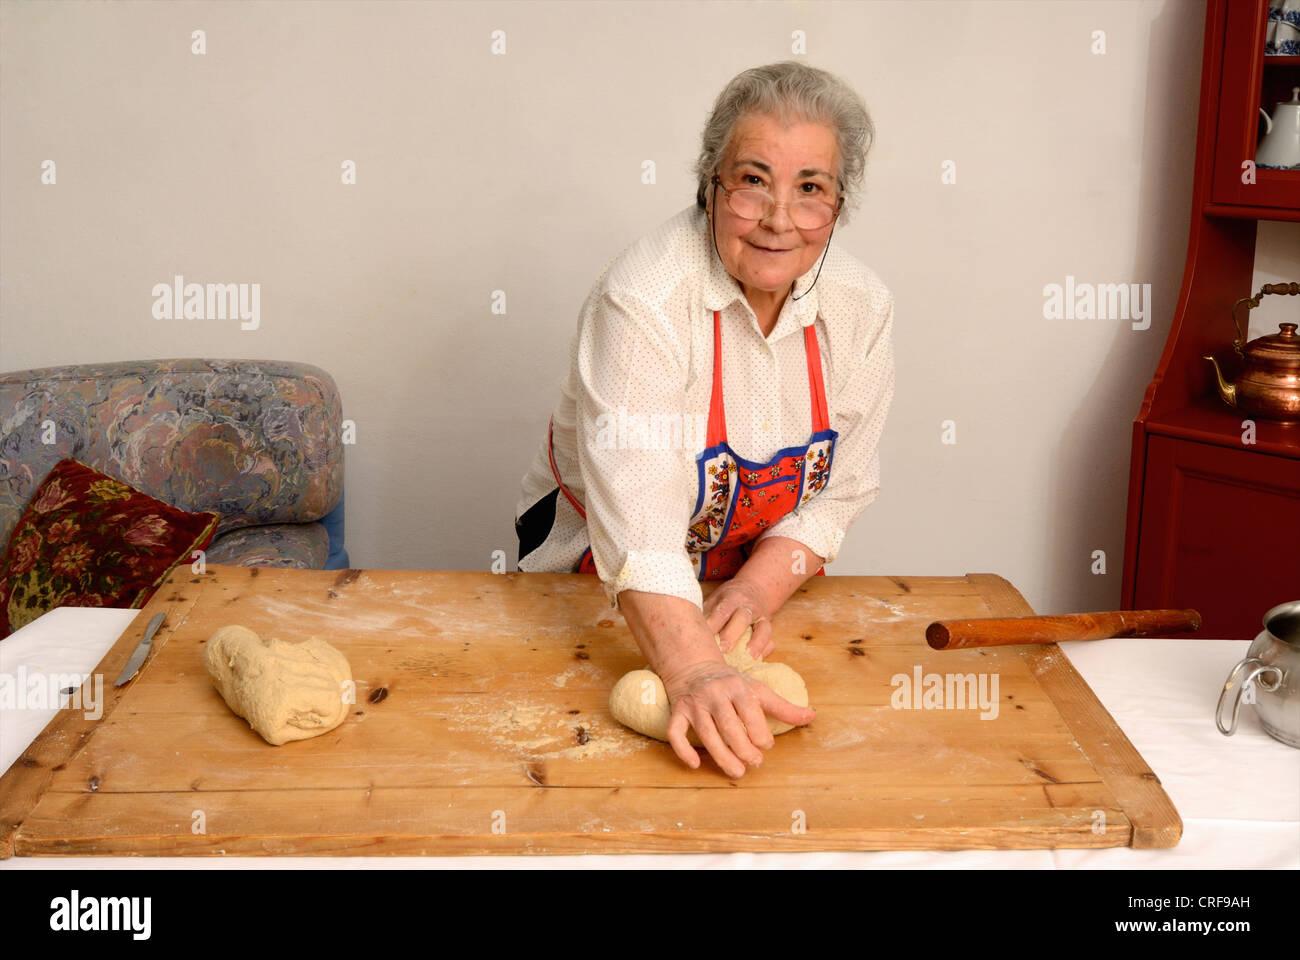 Older woman kneading dough on board Stock Photo